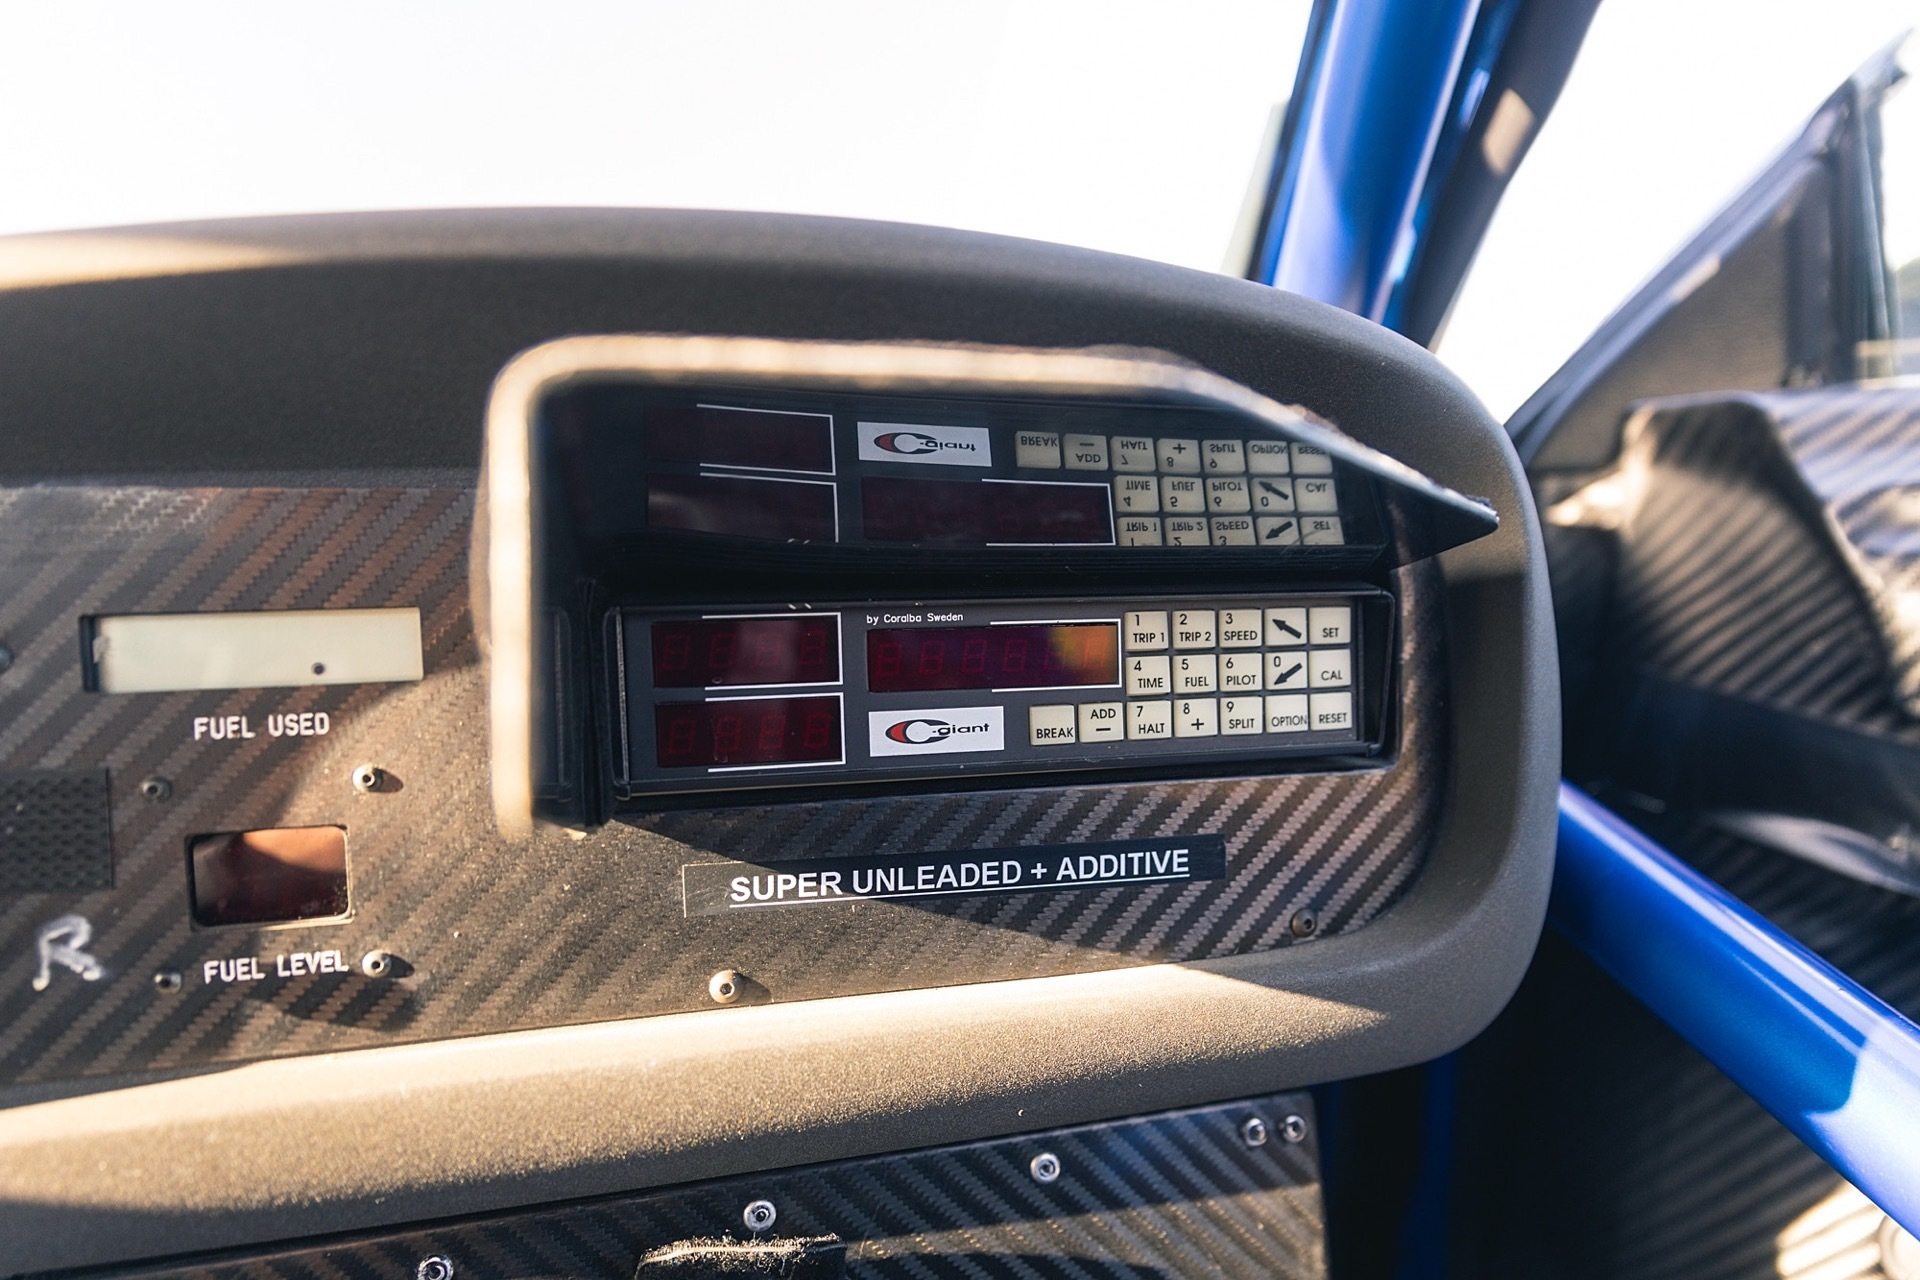 Richard_Burns_Subaru_Impreza_WRC_sale-0009